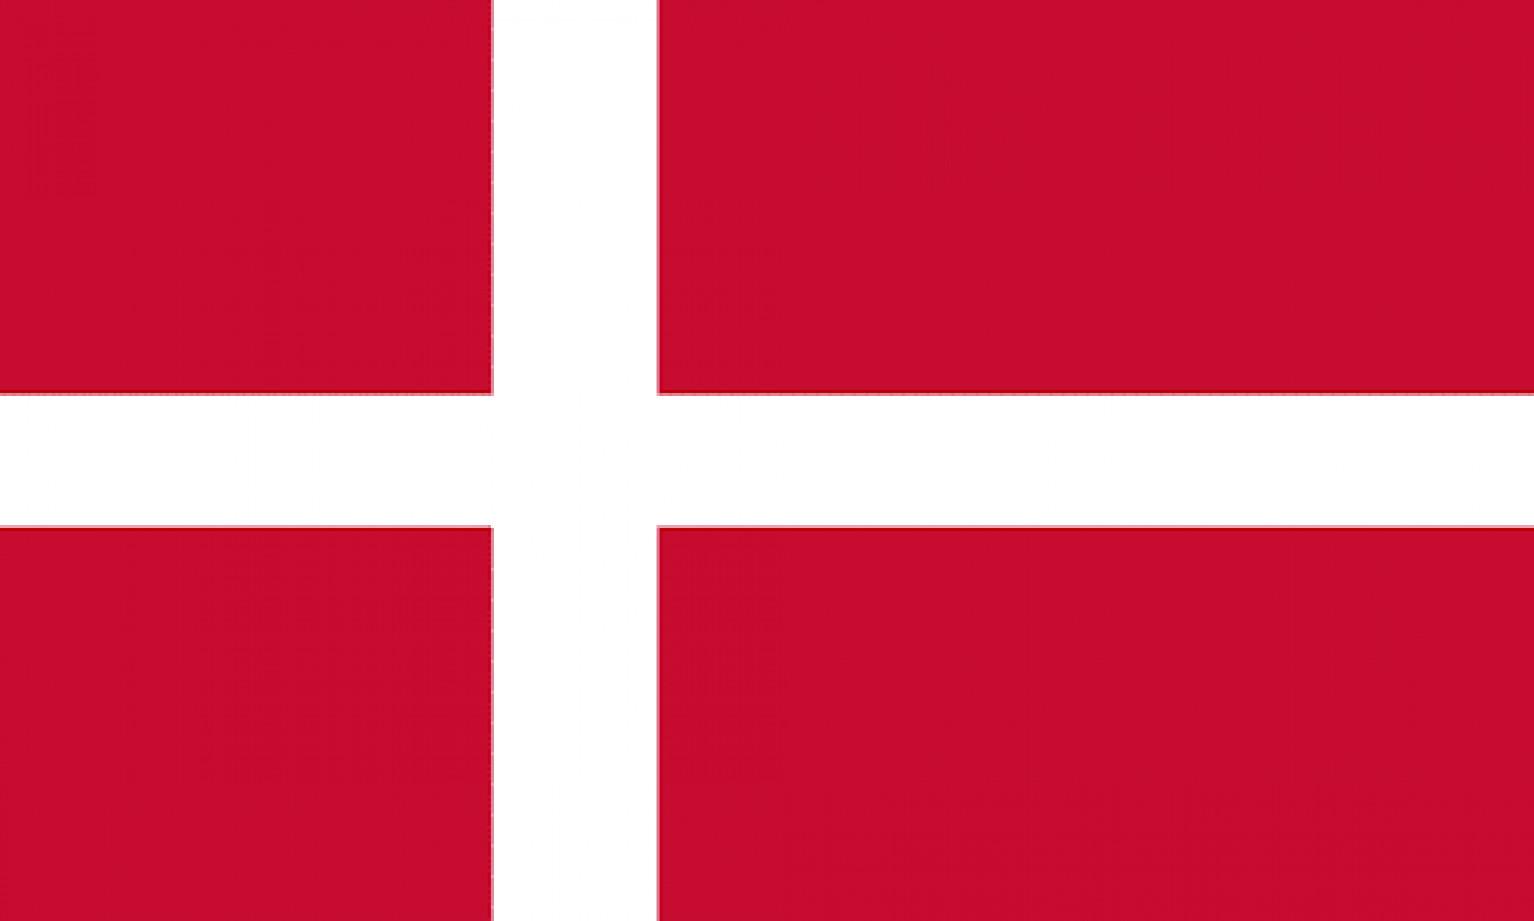 Danish Peer-to-Peer lending platforms and market